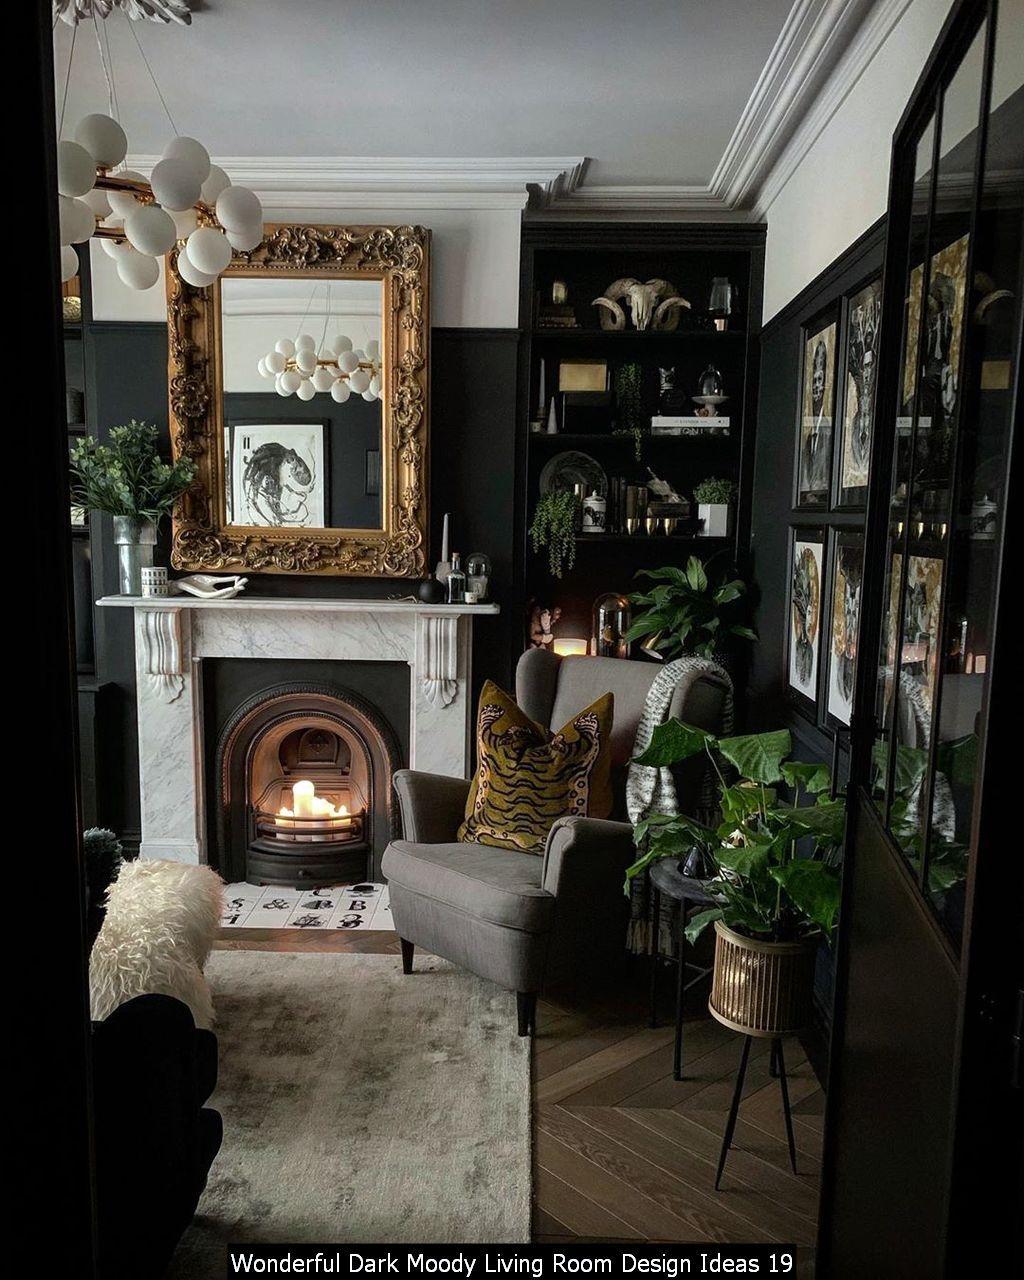 Wonderful Dark Moody Living Room Design Ideas Victorian Home Decor Moody Living Room Dark Living Rooms